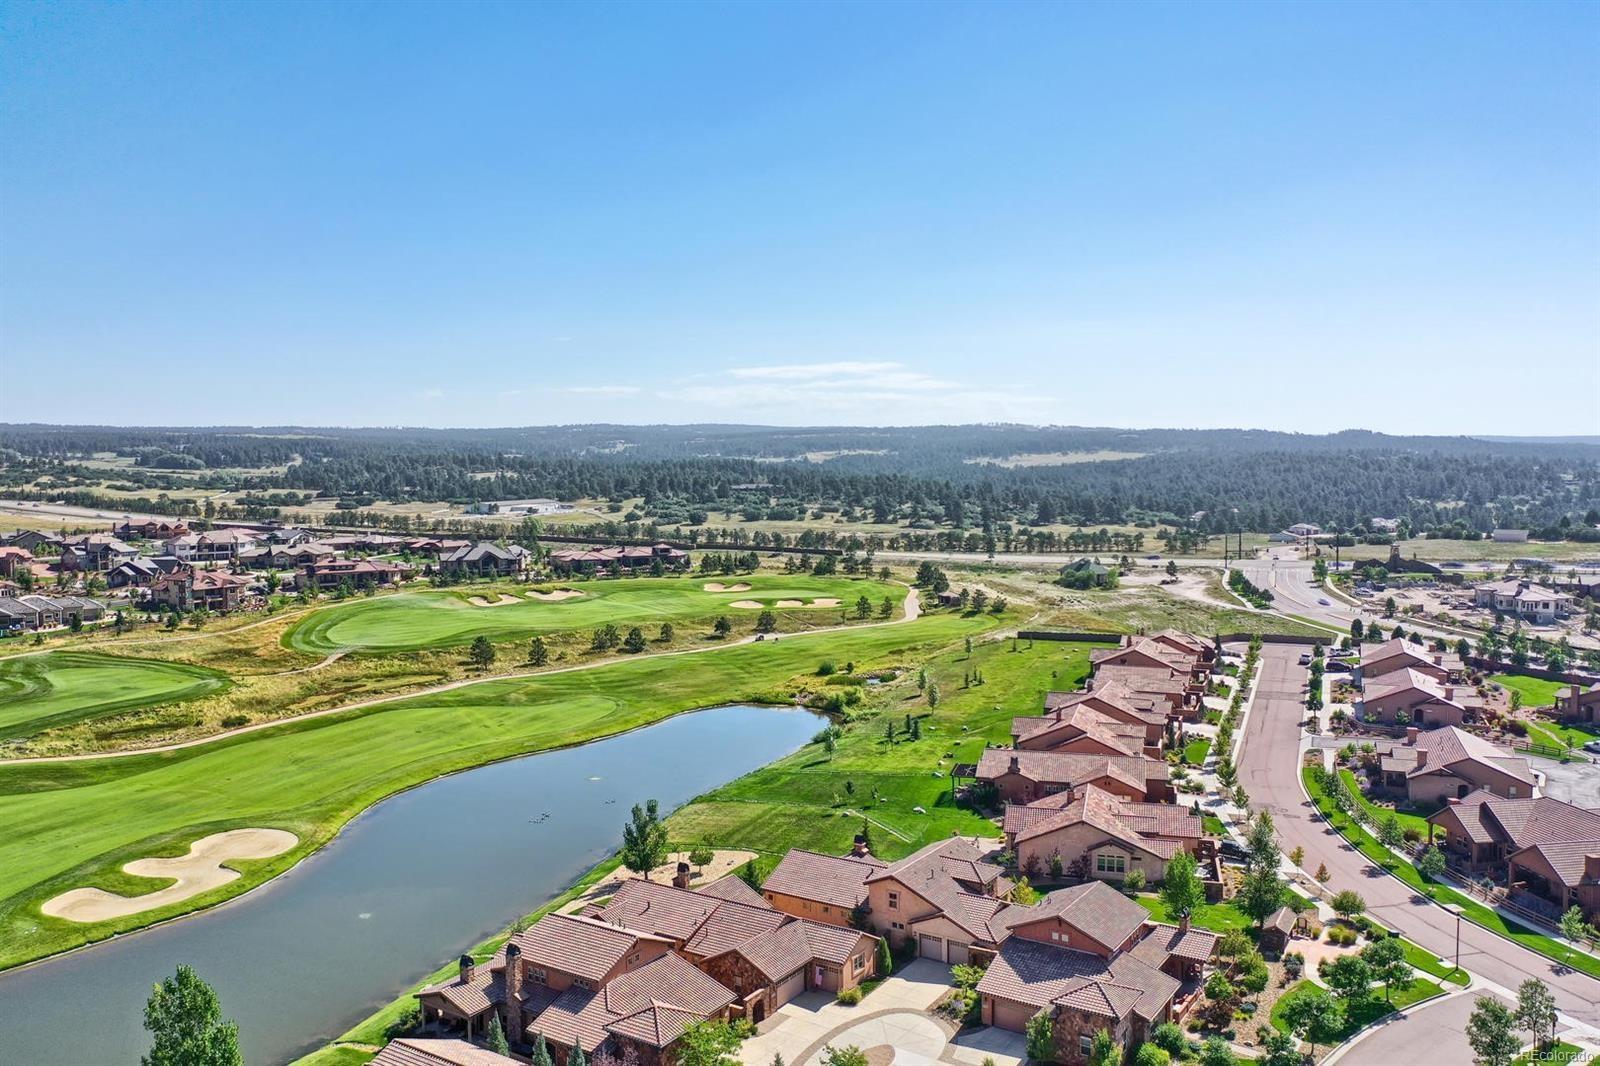 MLS# 7383029 - 30 - 2276 Rocking Horse Court, Colorado Springs, CO 80921